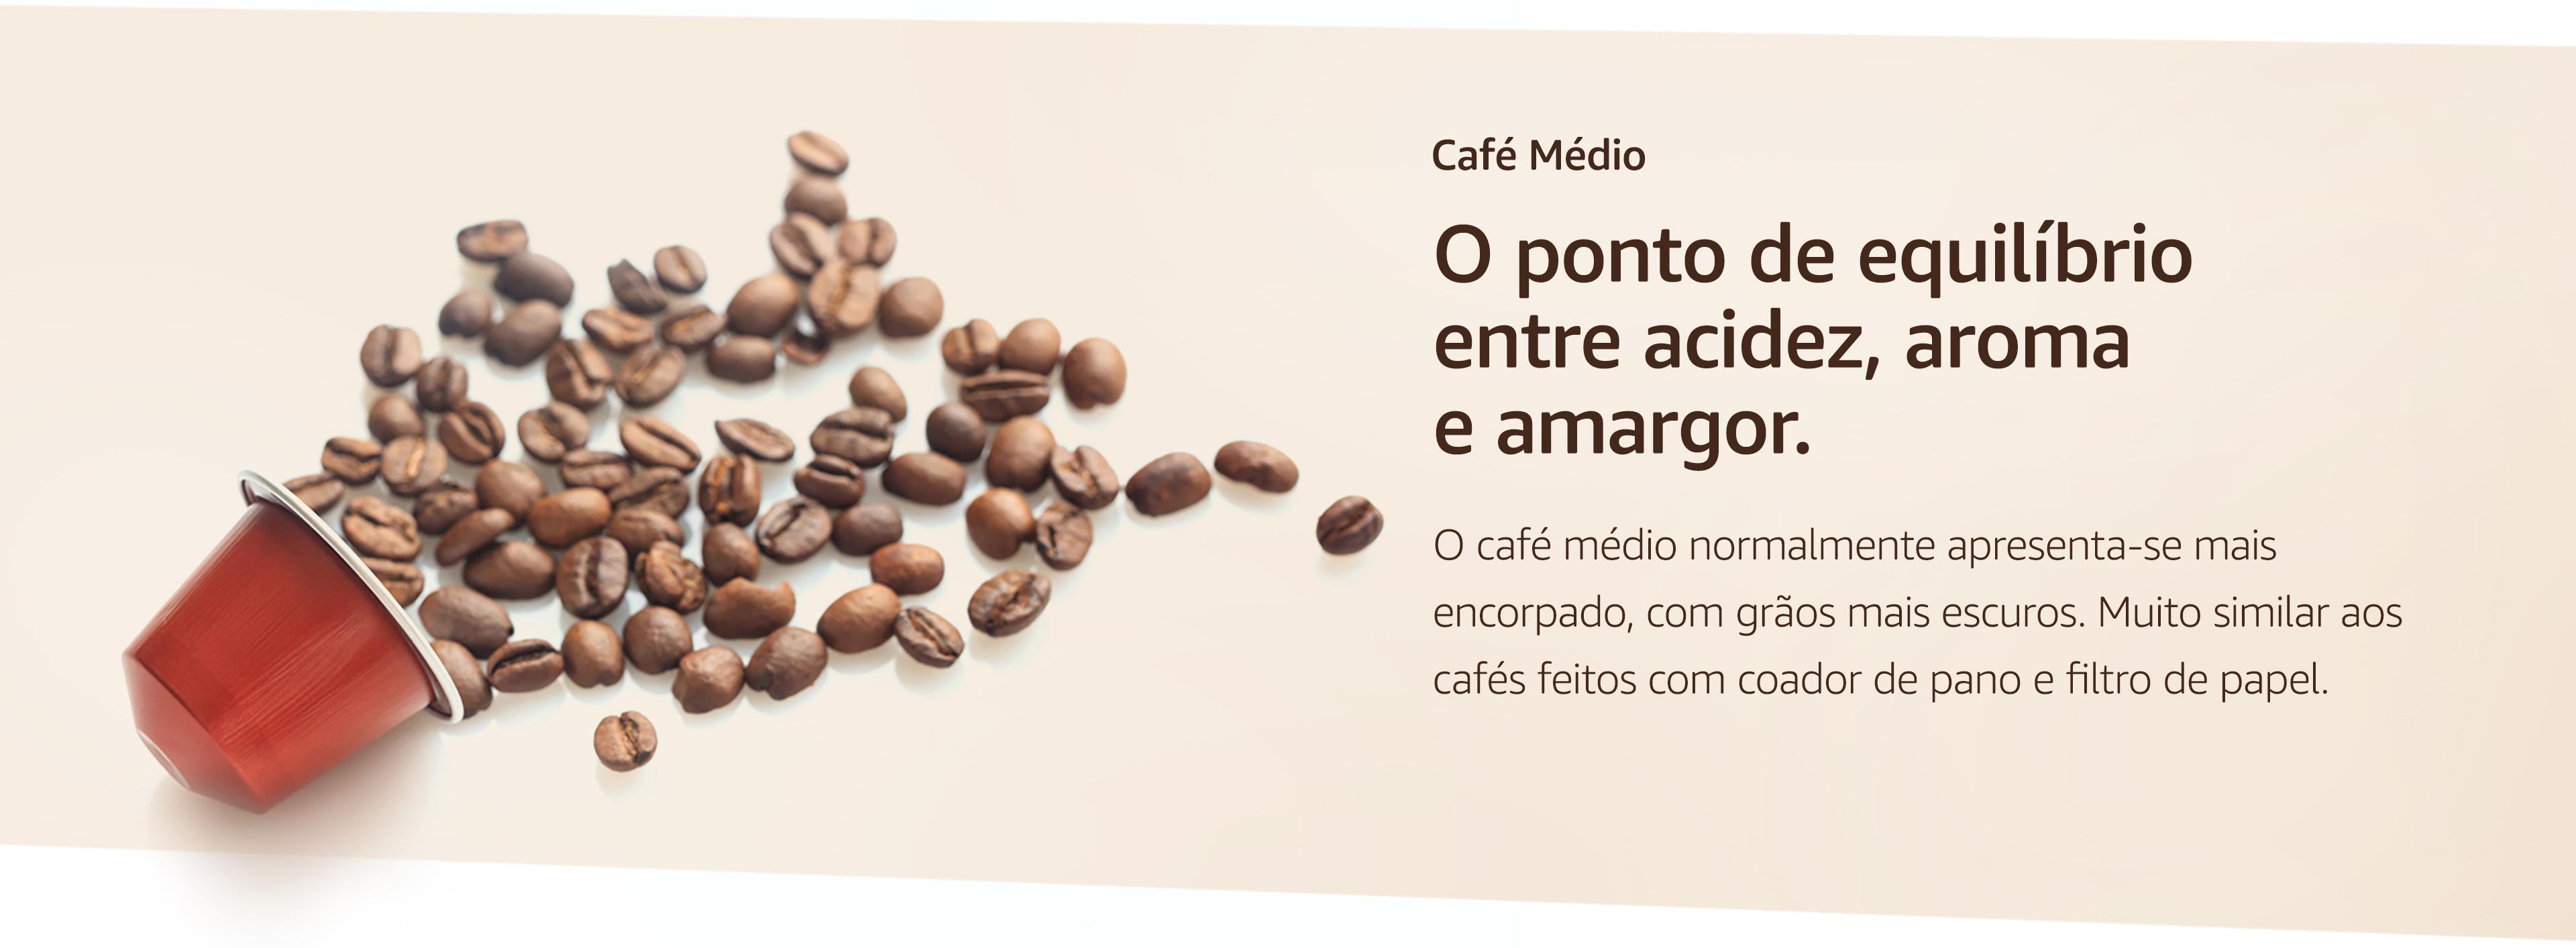 café médio